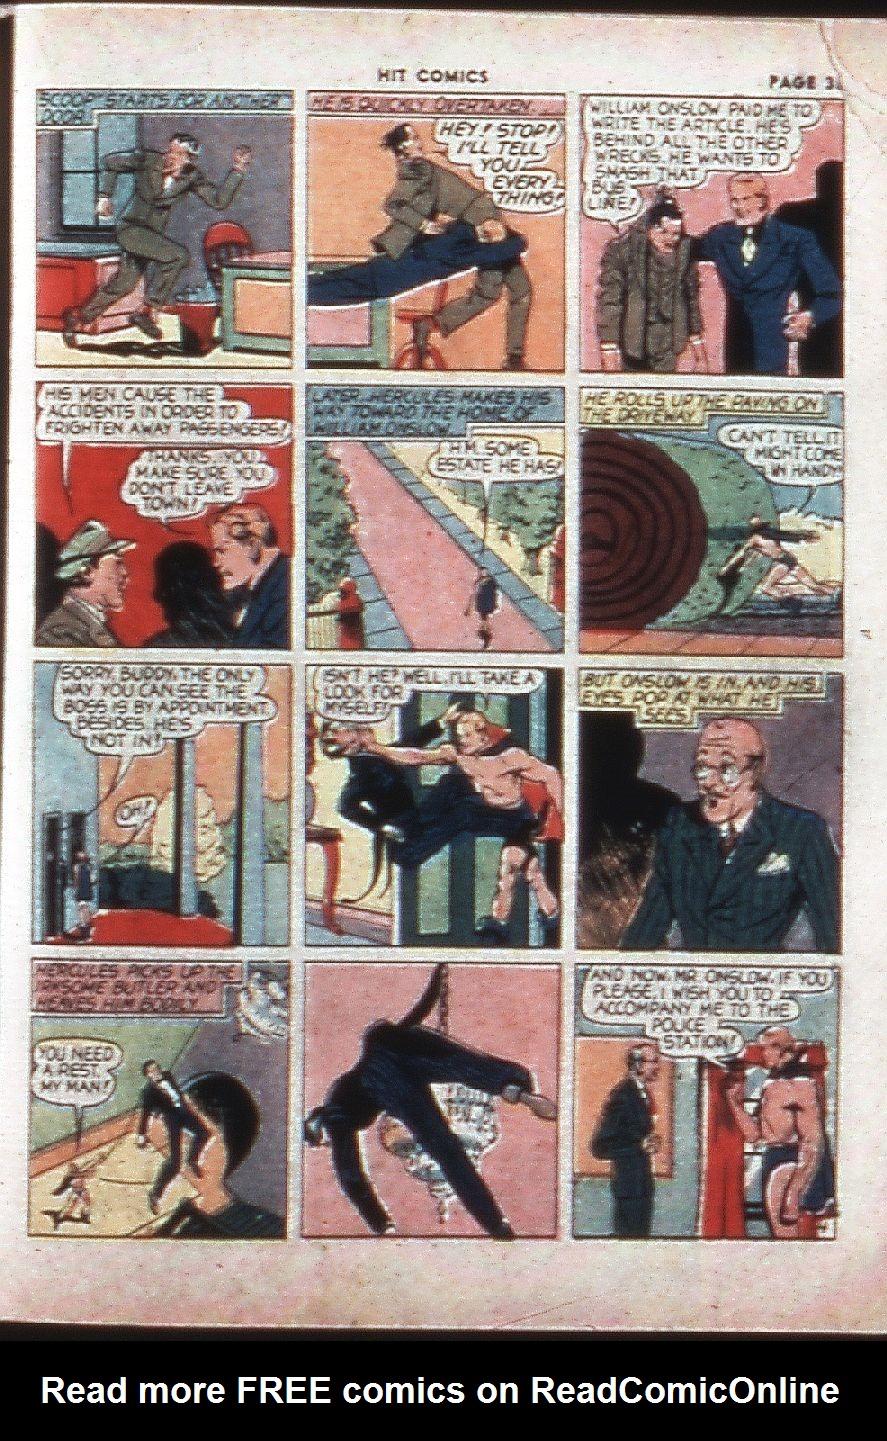 Read online Hit Comics comic -  Issue #4 - 37